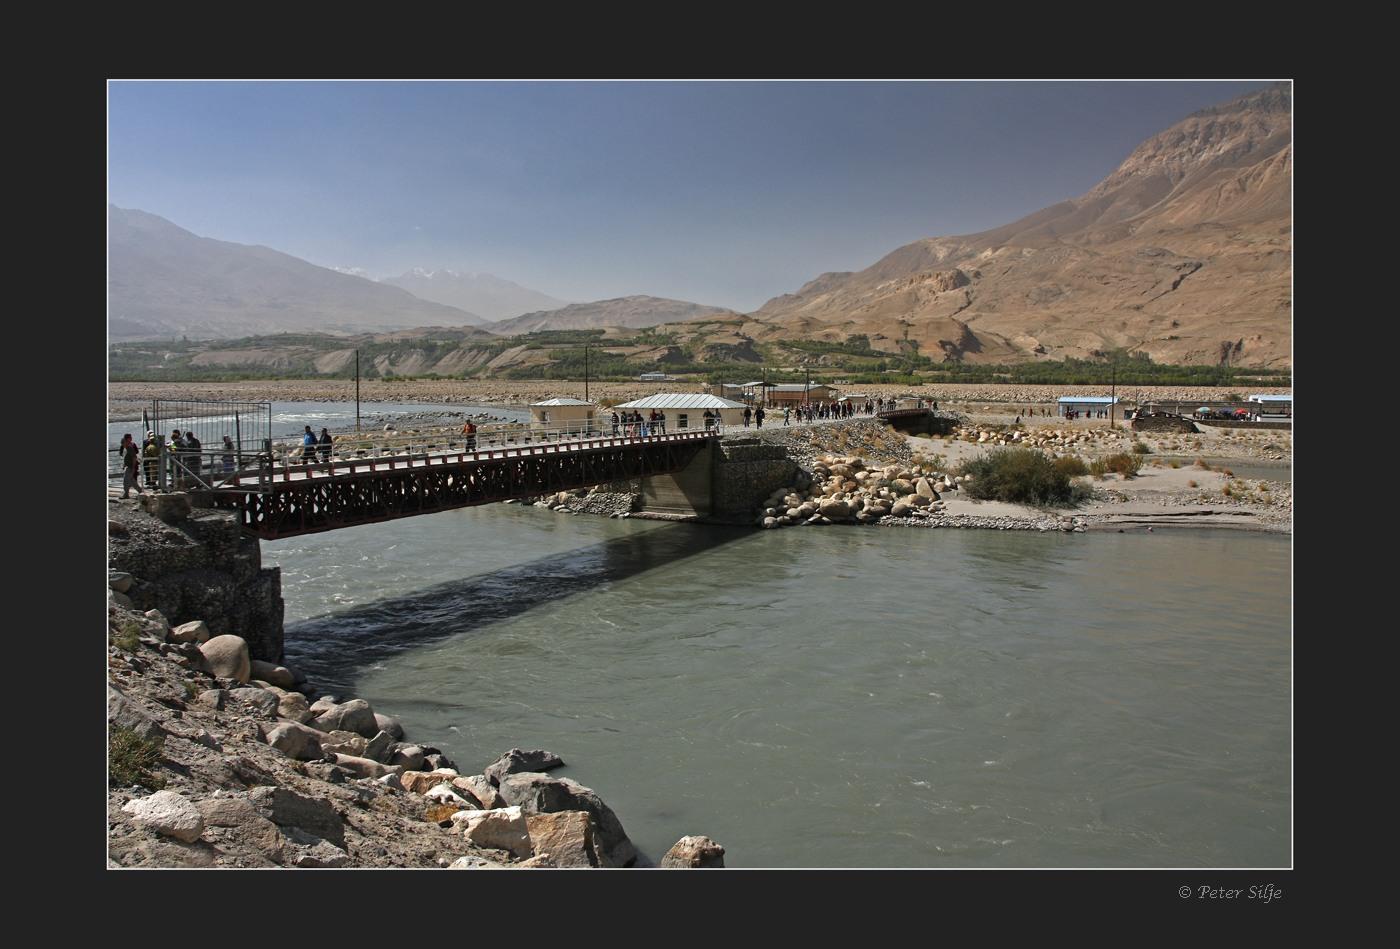 WGCA [36] - DER WEG NACH AFGHANISTAN